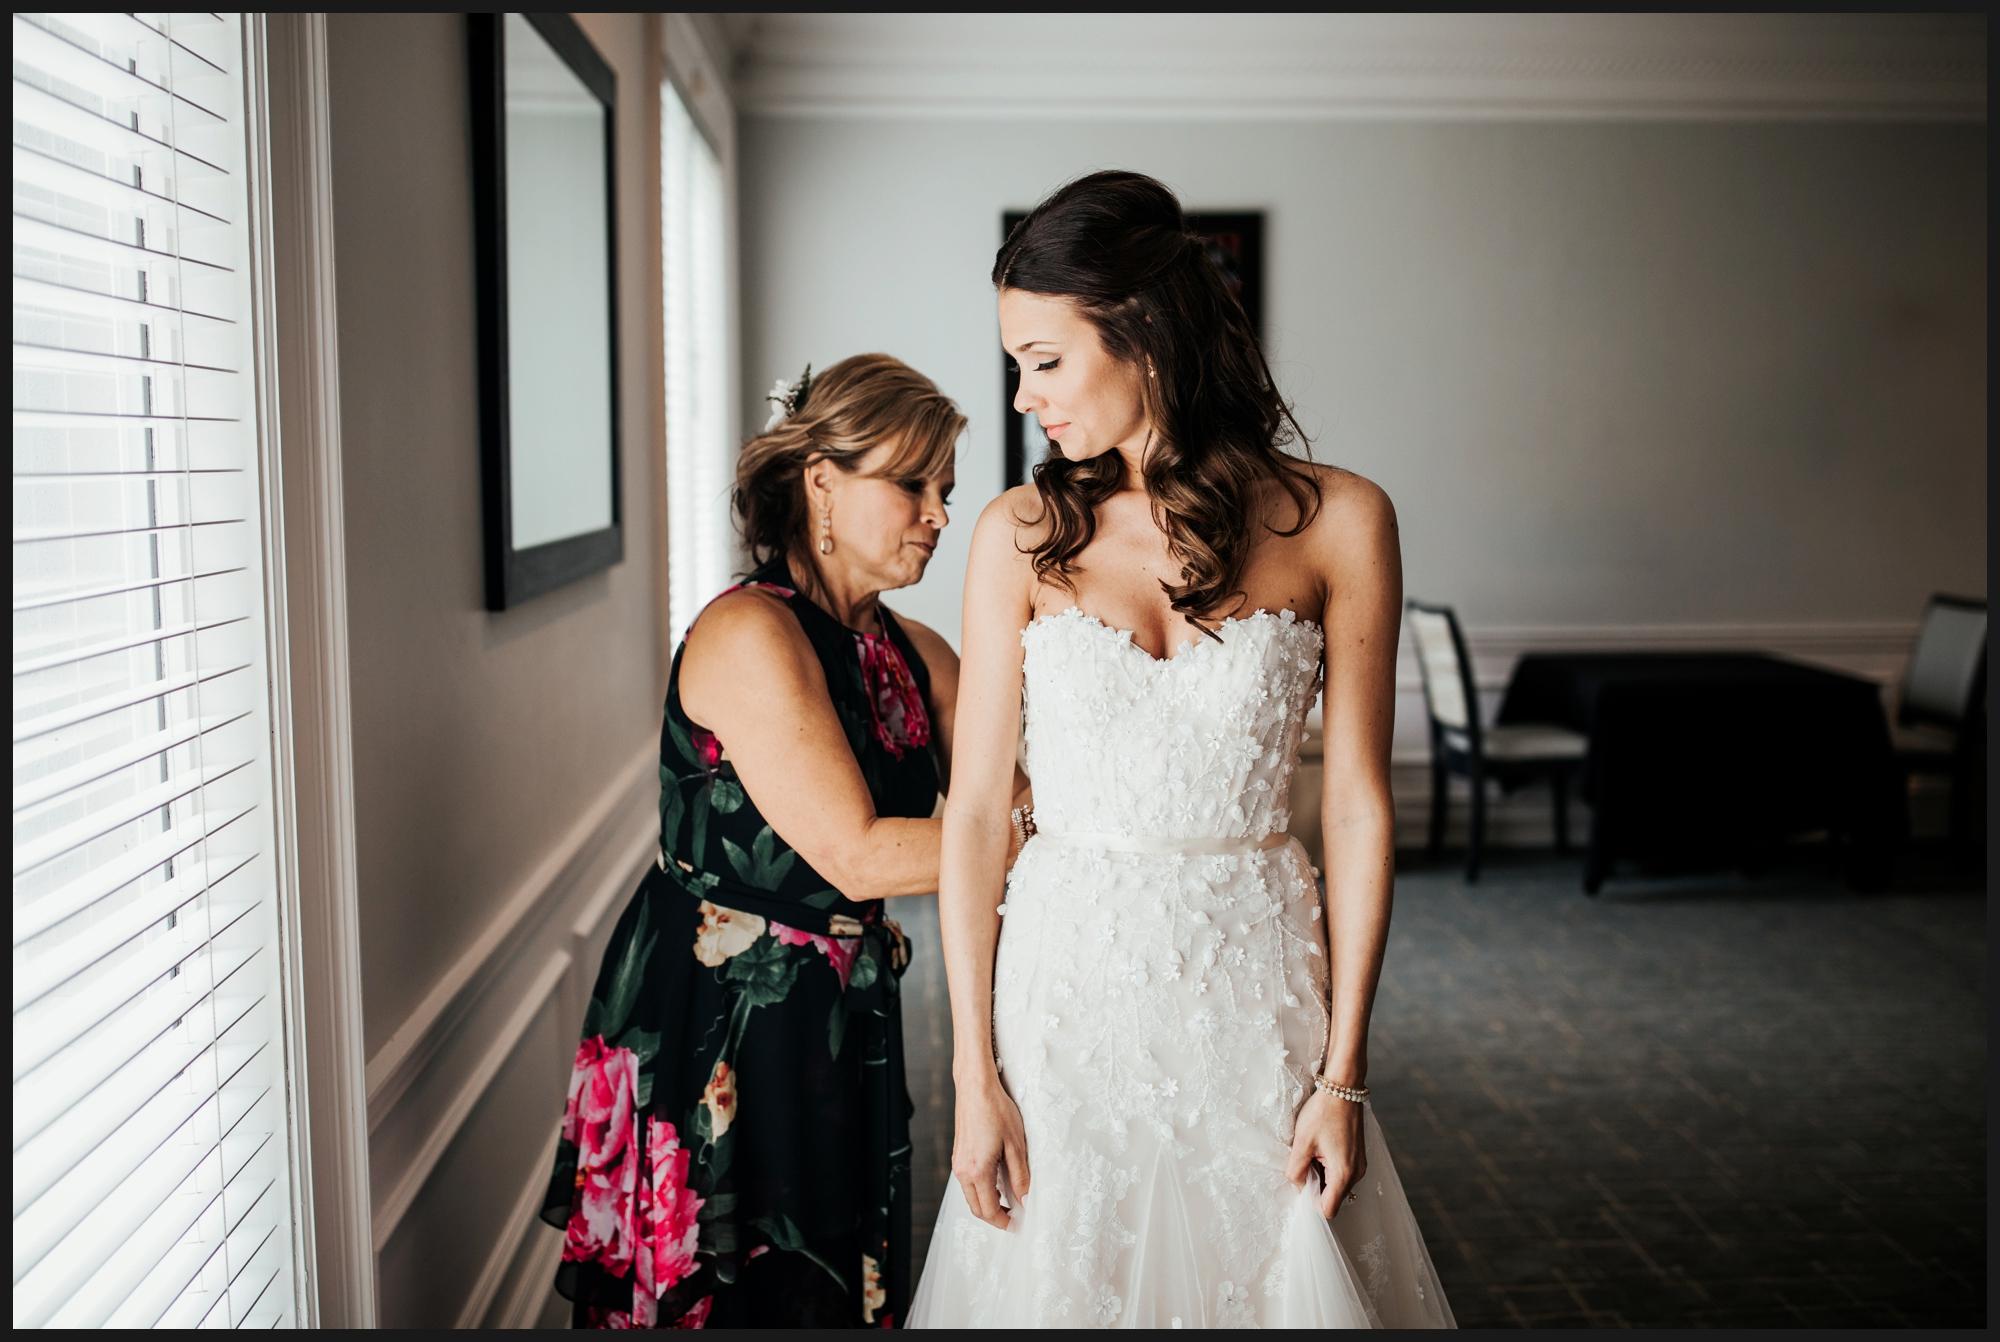 Orlando-Wedding-Photographer-destination-wedding-photographer-florida-wedding-photographer-hawaii-wedding-photographer_0198.jpg